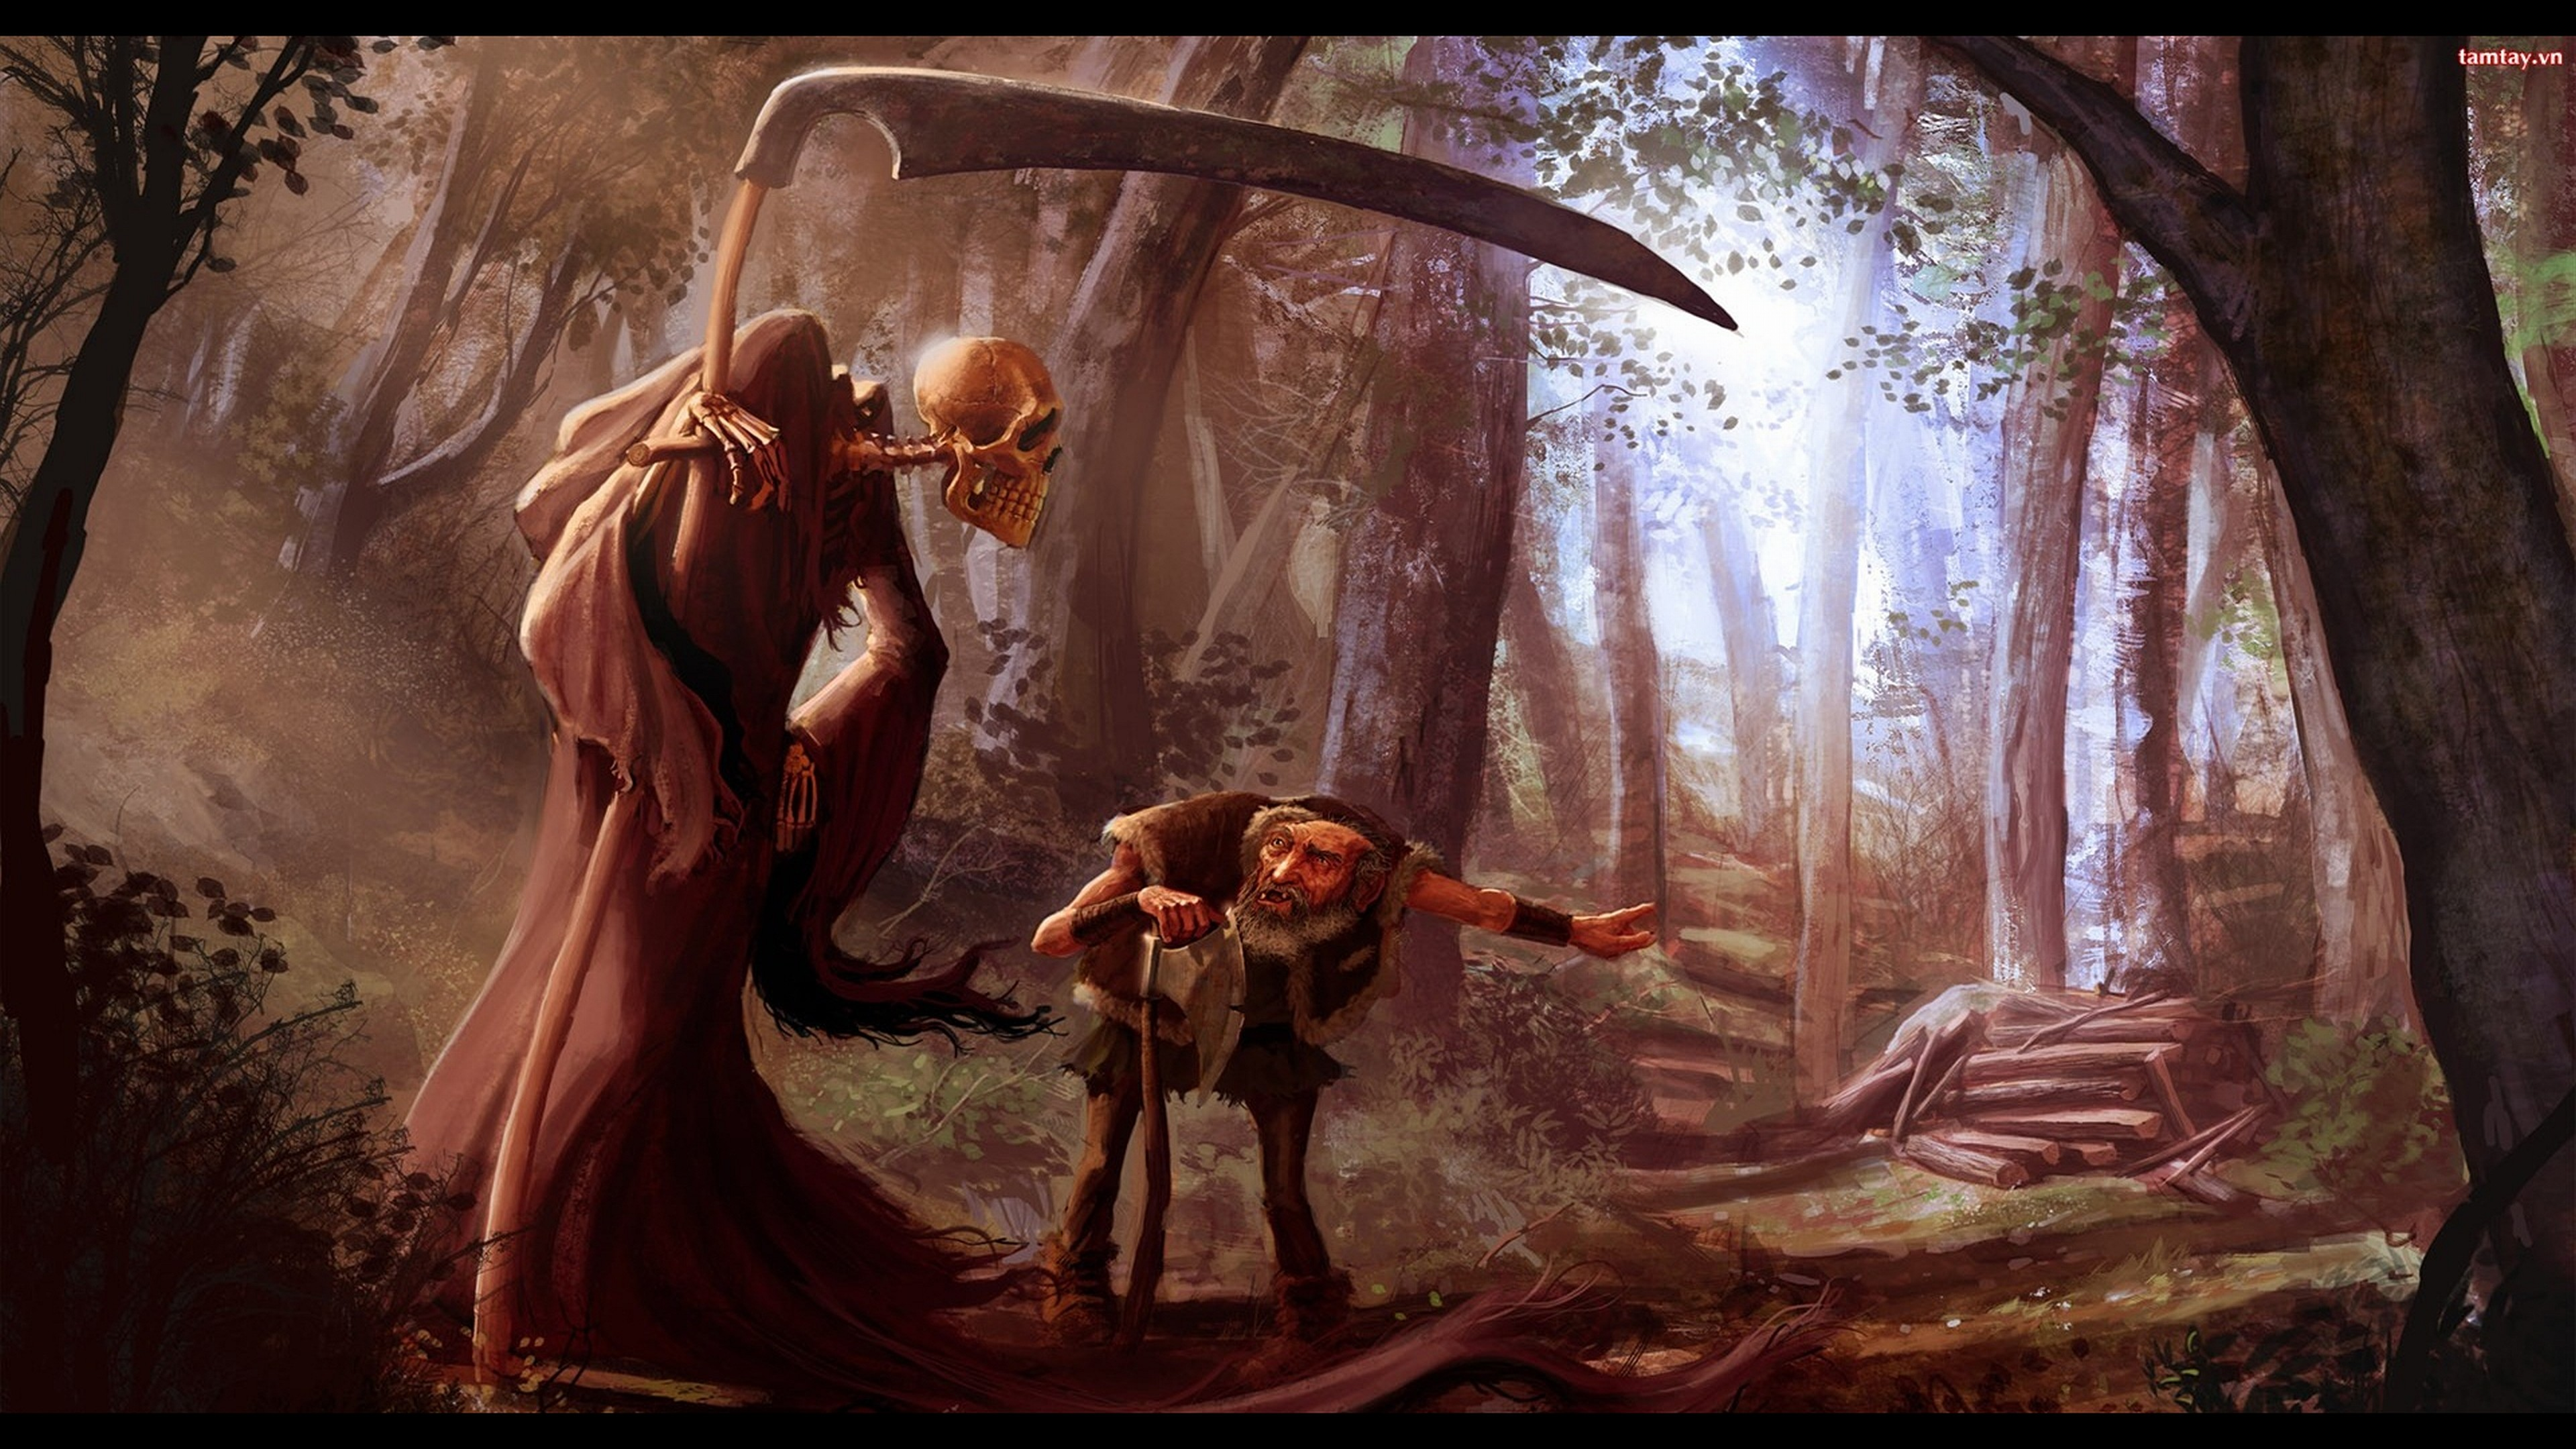 Res: 3840x2160, Dark - Grim Reaper Dwarf Scythe Evil Wallpaper